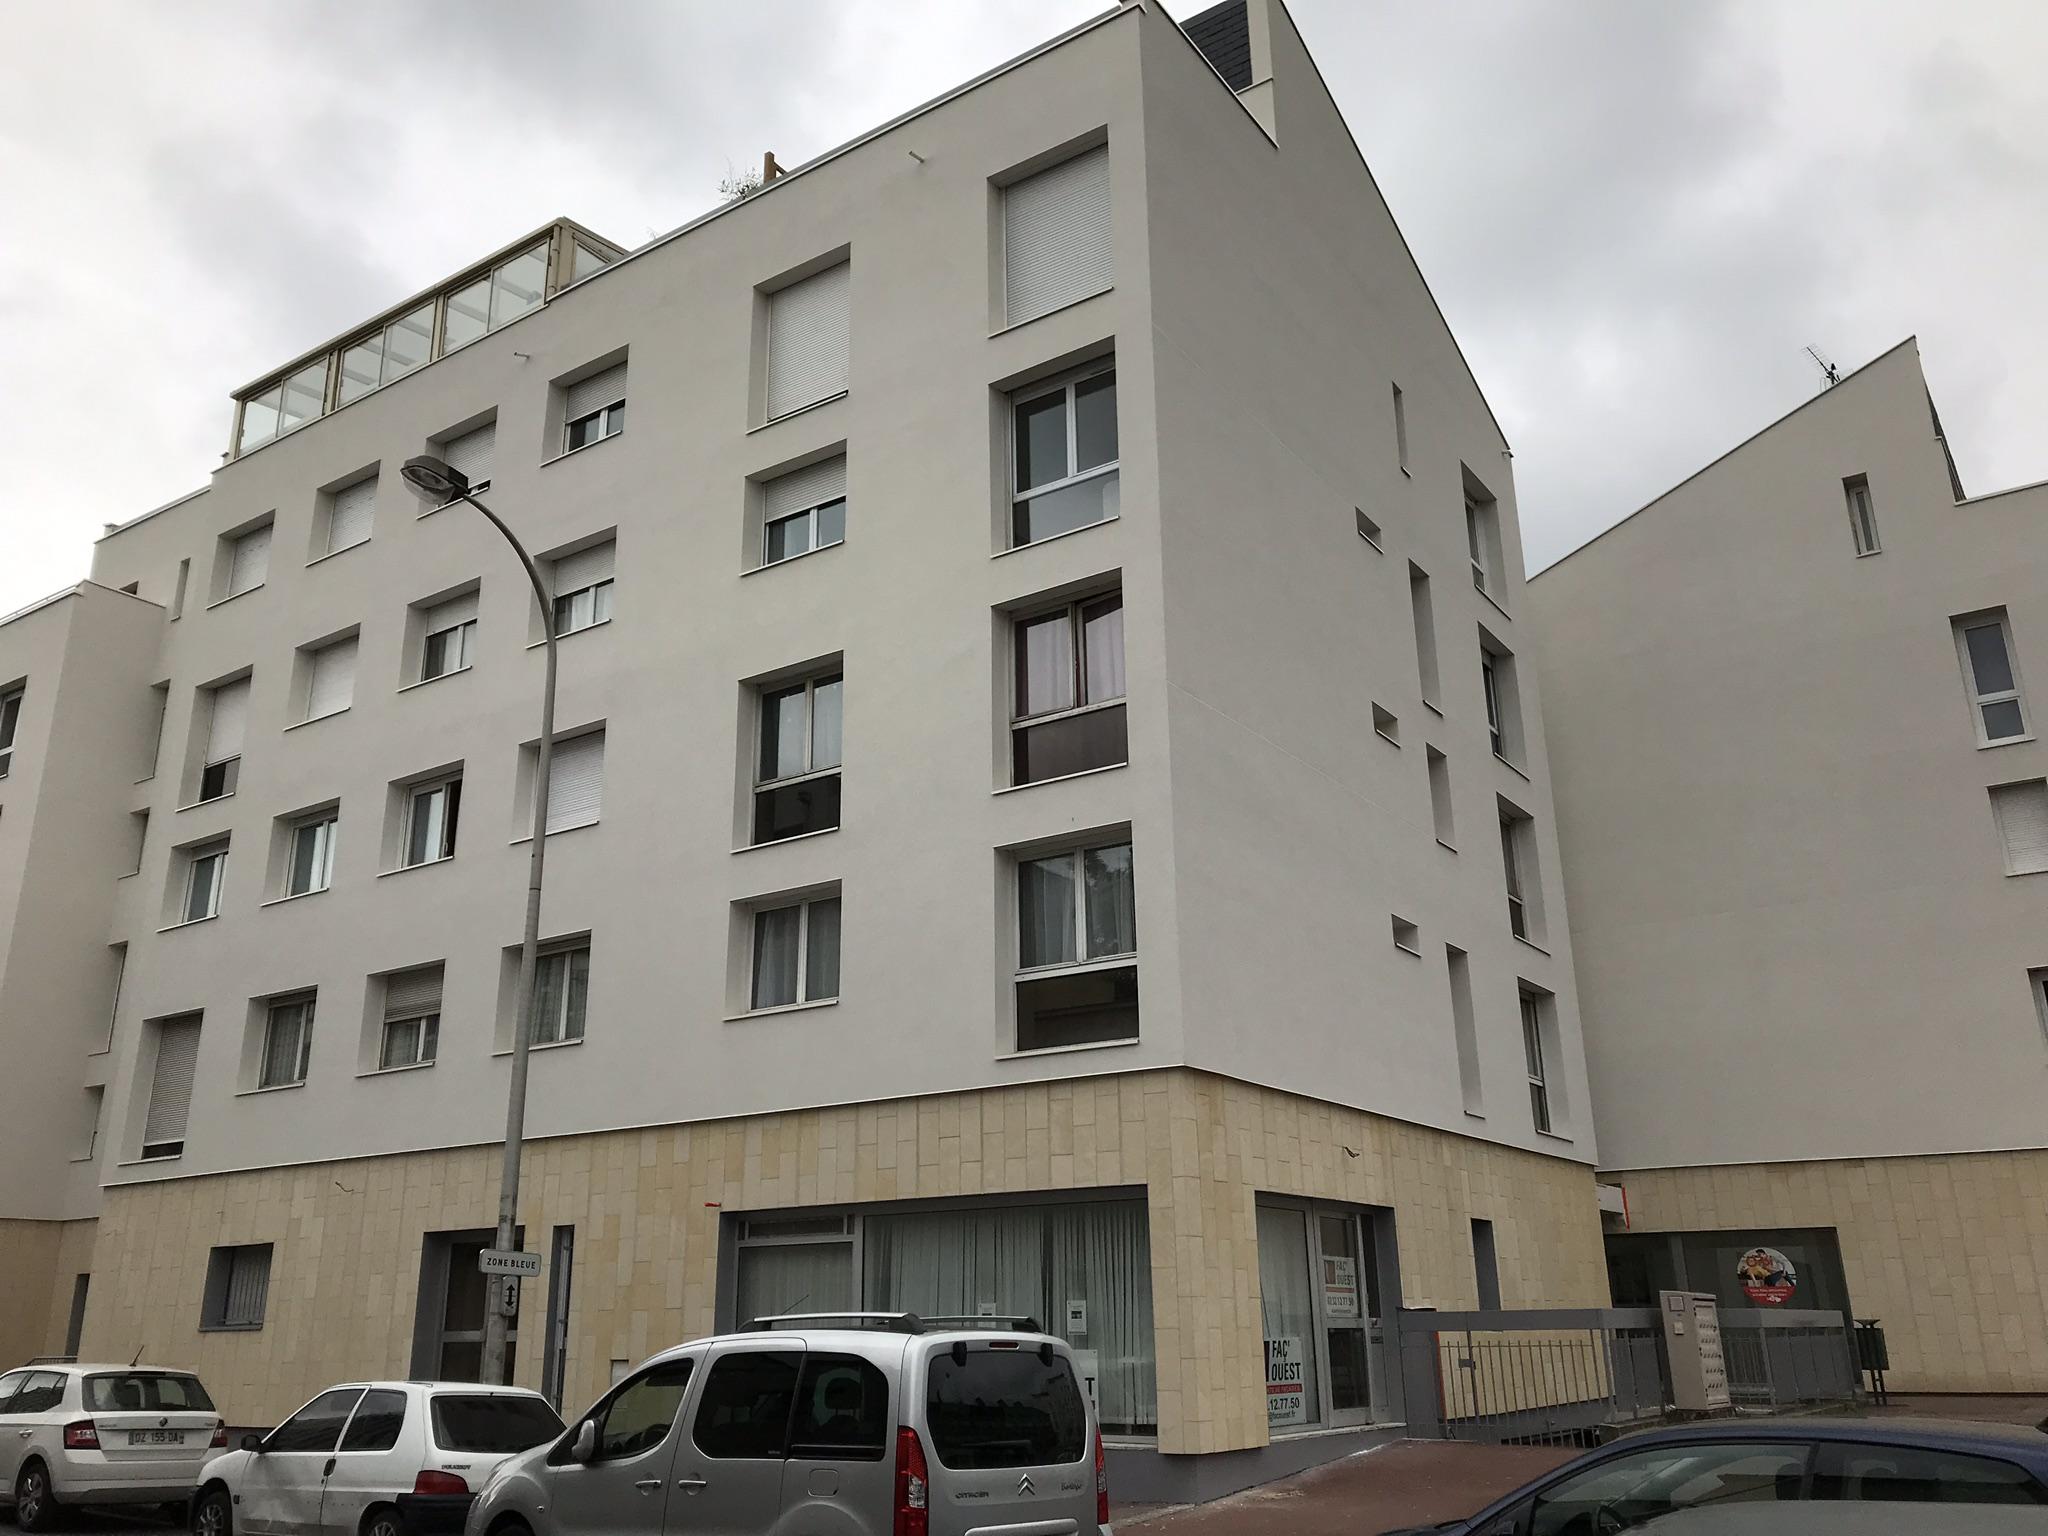 Résidence Albert Dugué - Hauts-de-France Pass Rénovation